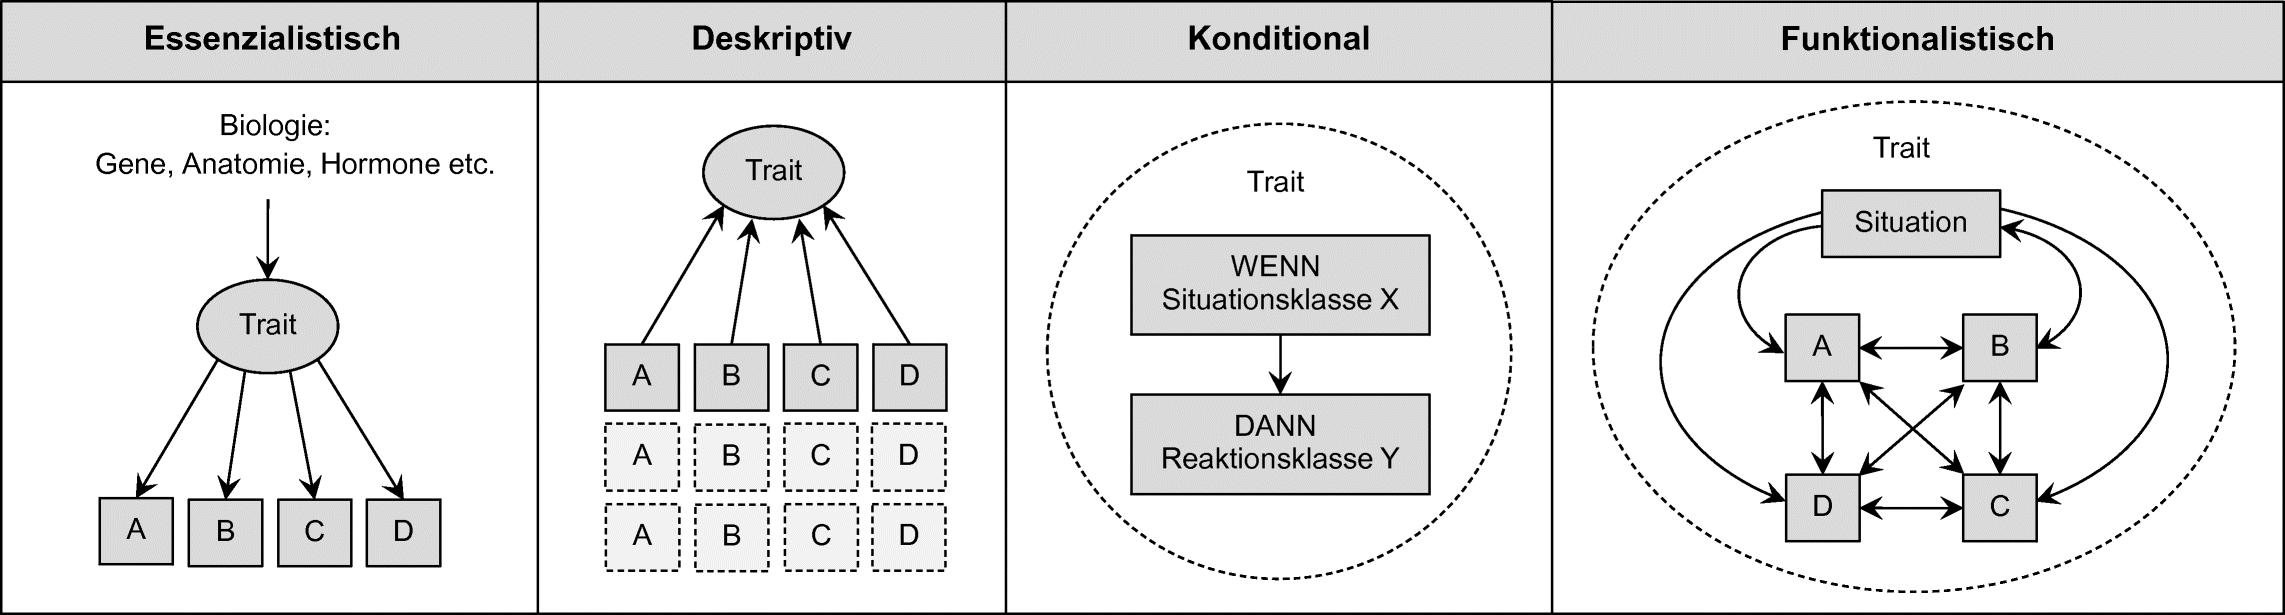 Dispositionales Paradigma | SpringerLink